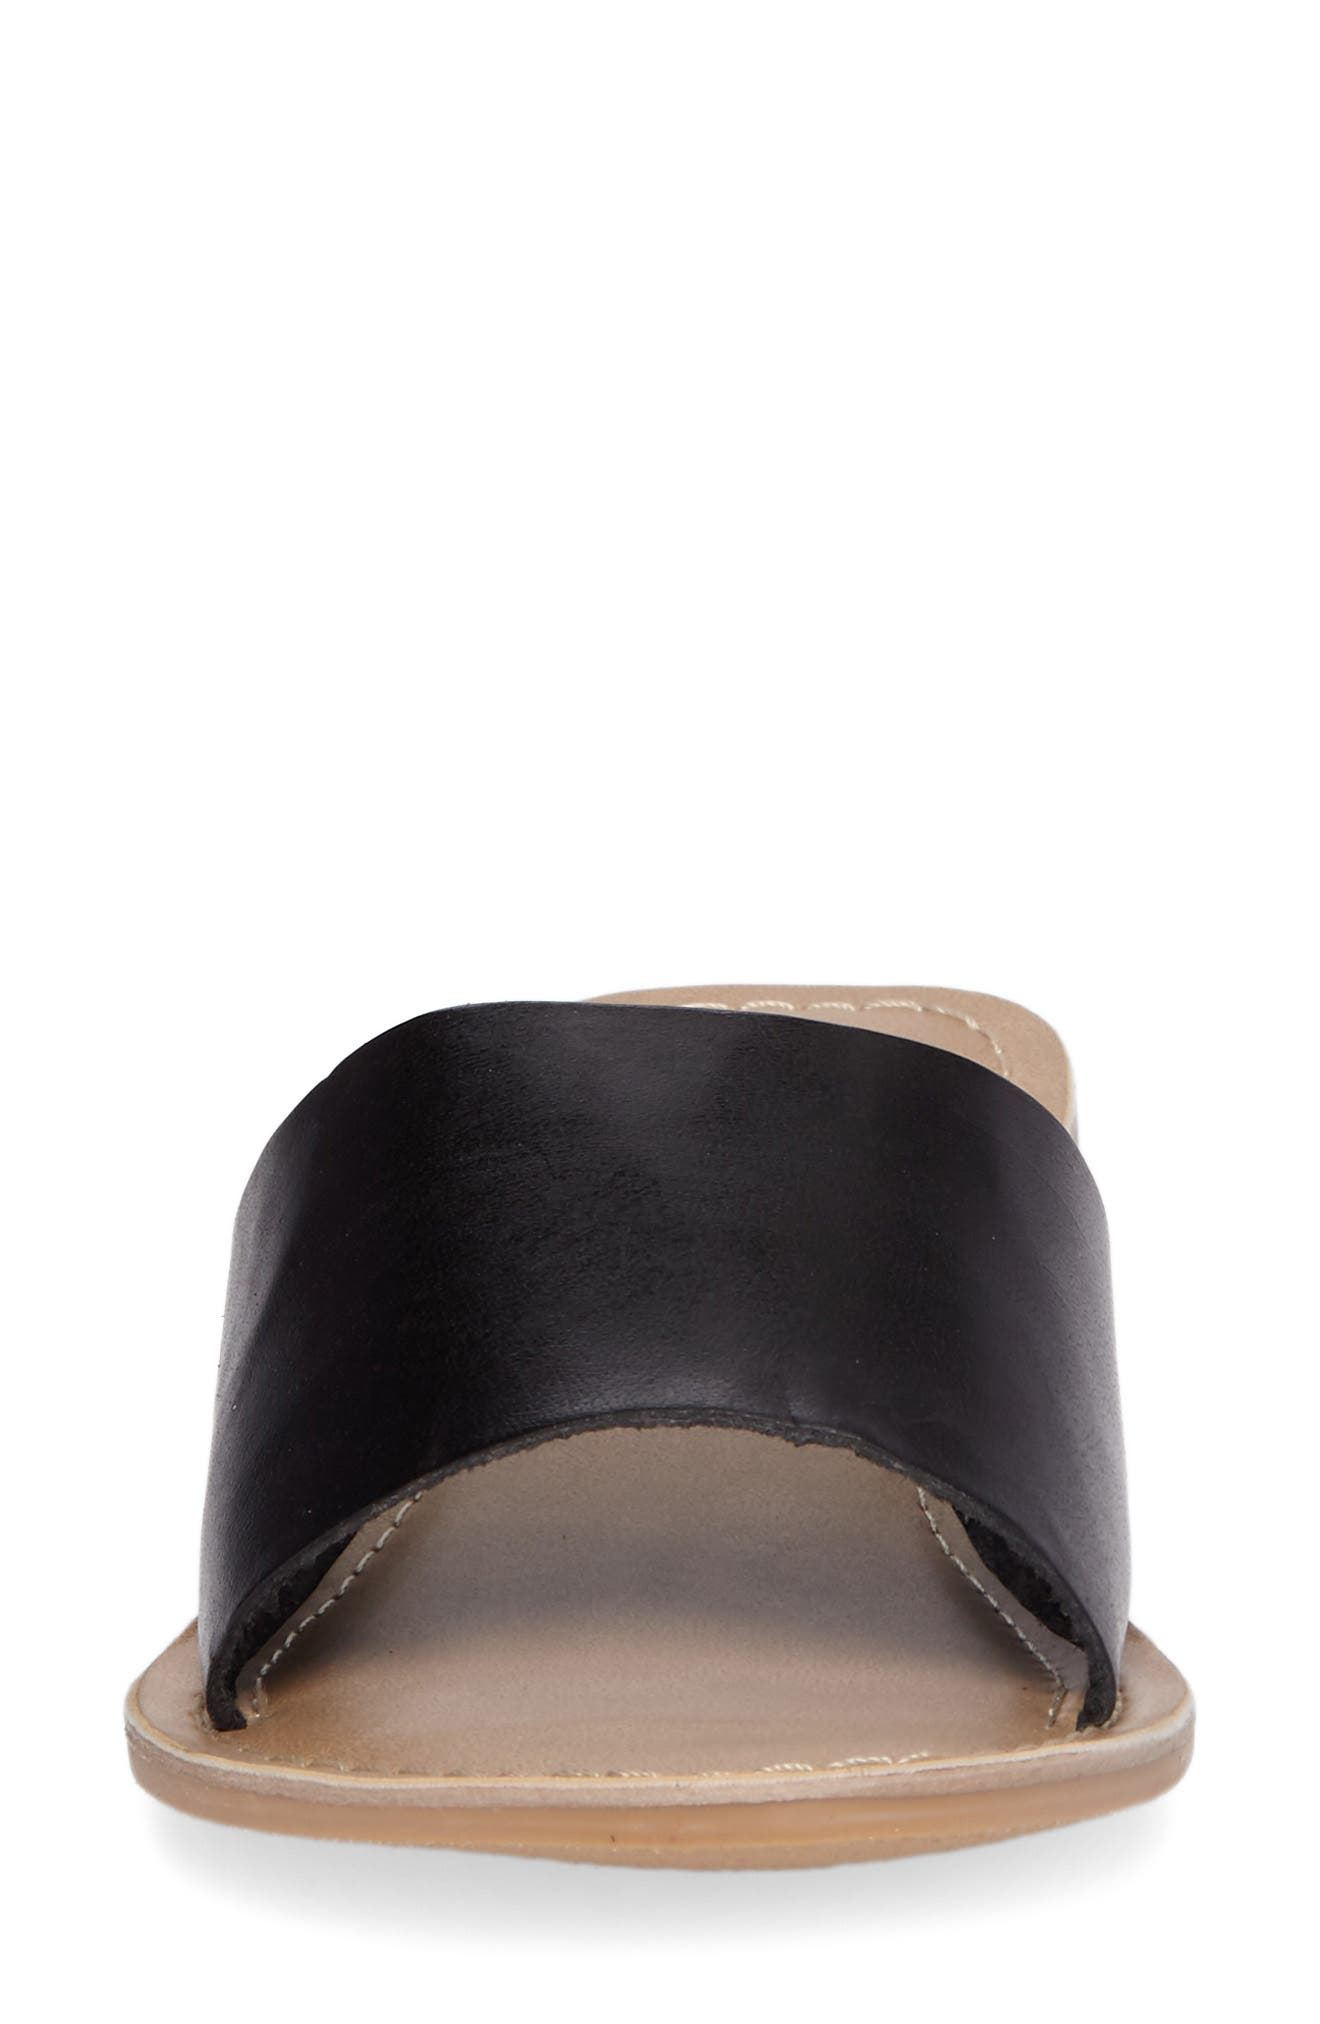 Cabana Slide Sandal,                             Alternate thumbnail 4, color,                             BLACK LEATHER